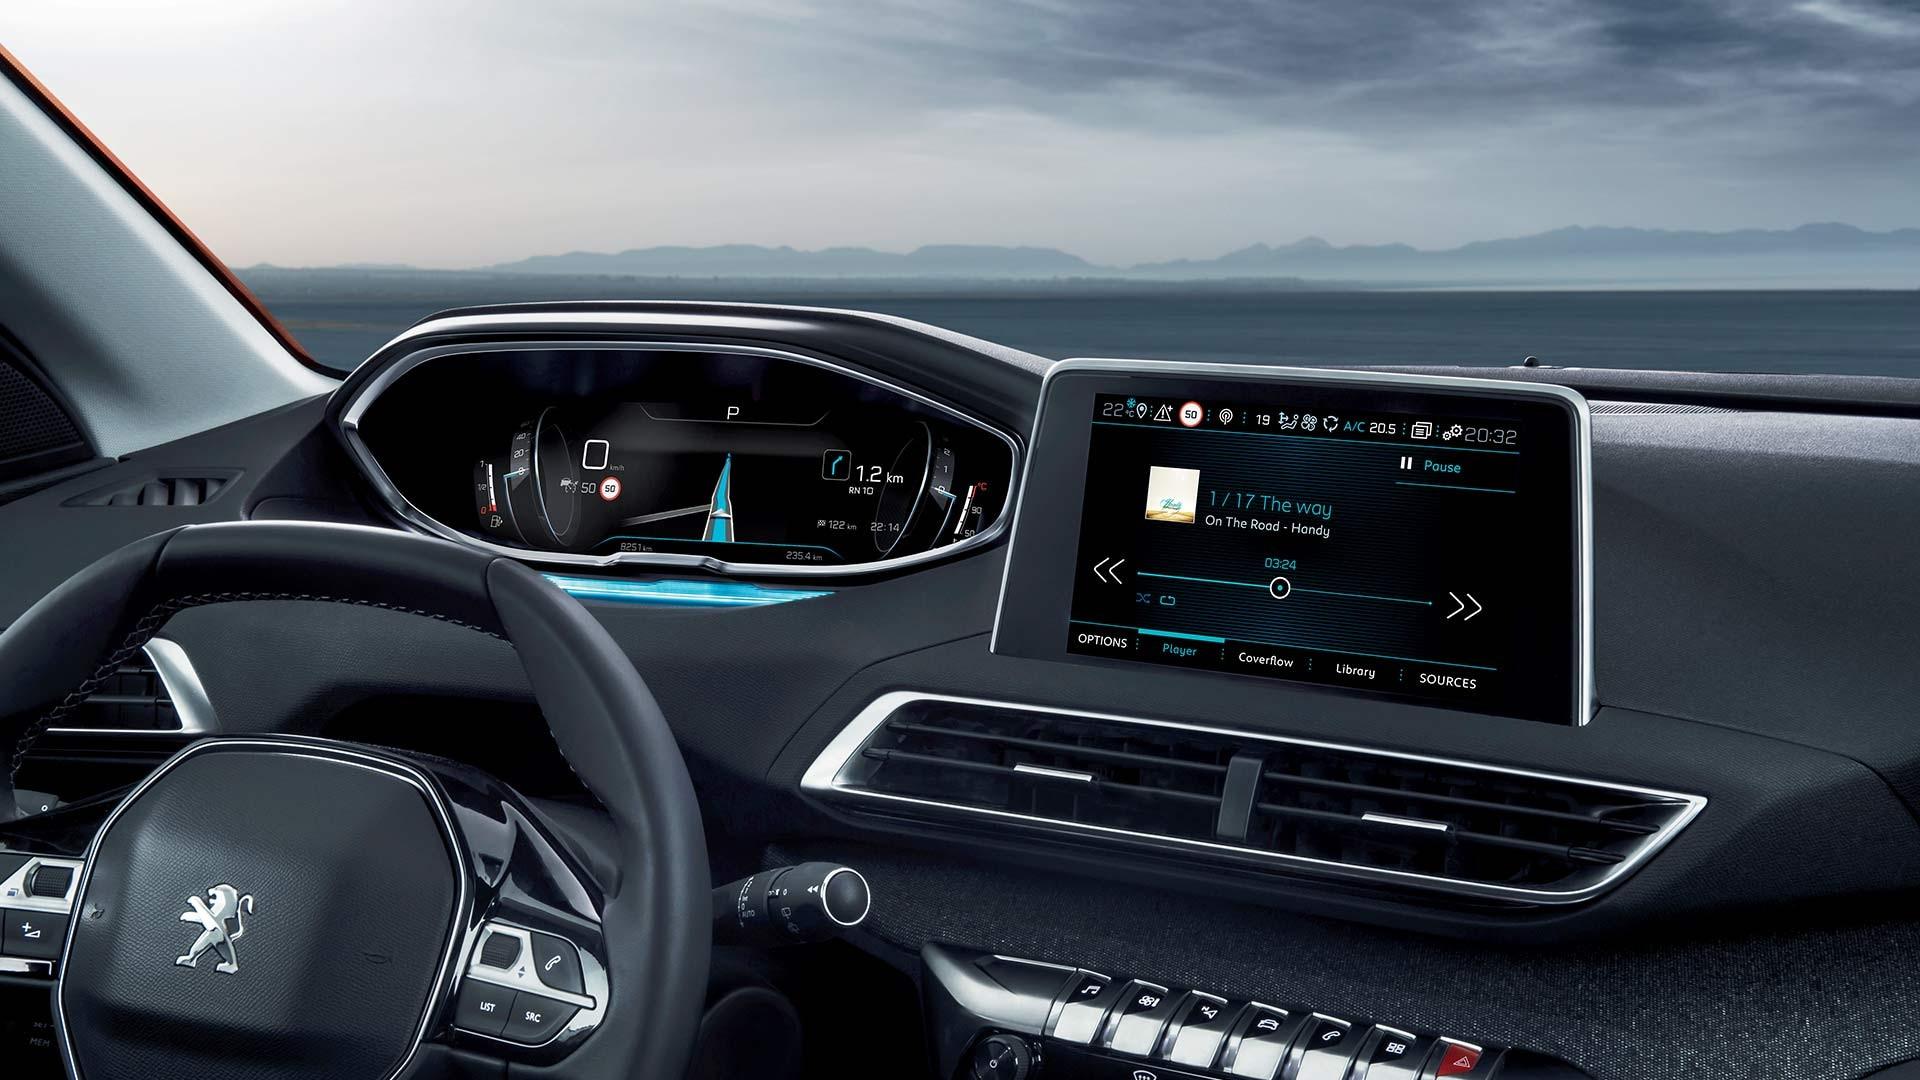 Yeni SUV Peugeot 3008 | Peugeot Türkiye